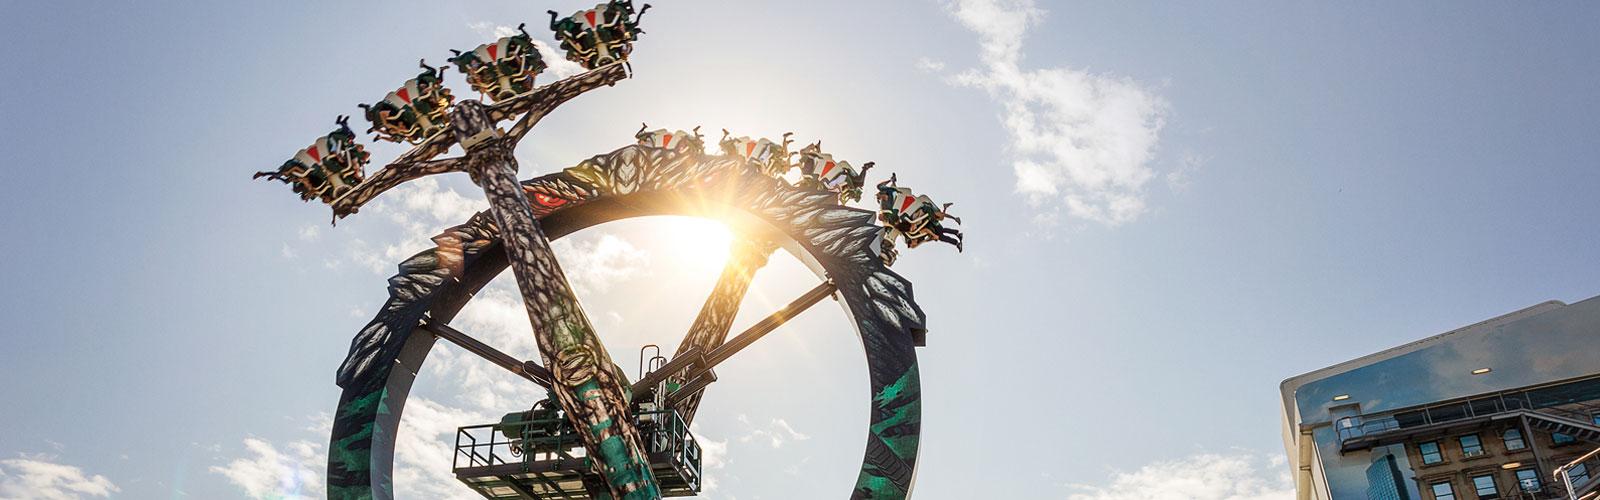 Gold Coast Theme Parks Deals 2019 Buy Online Experience Oz